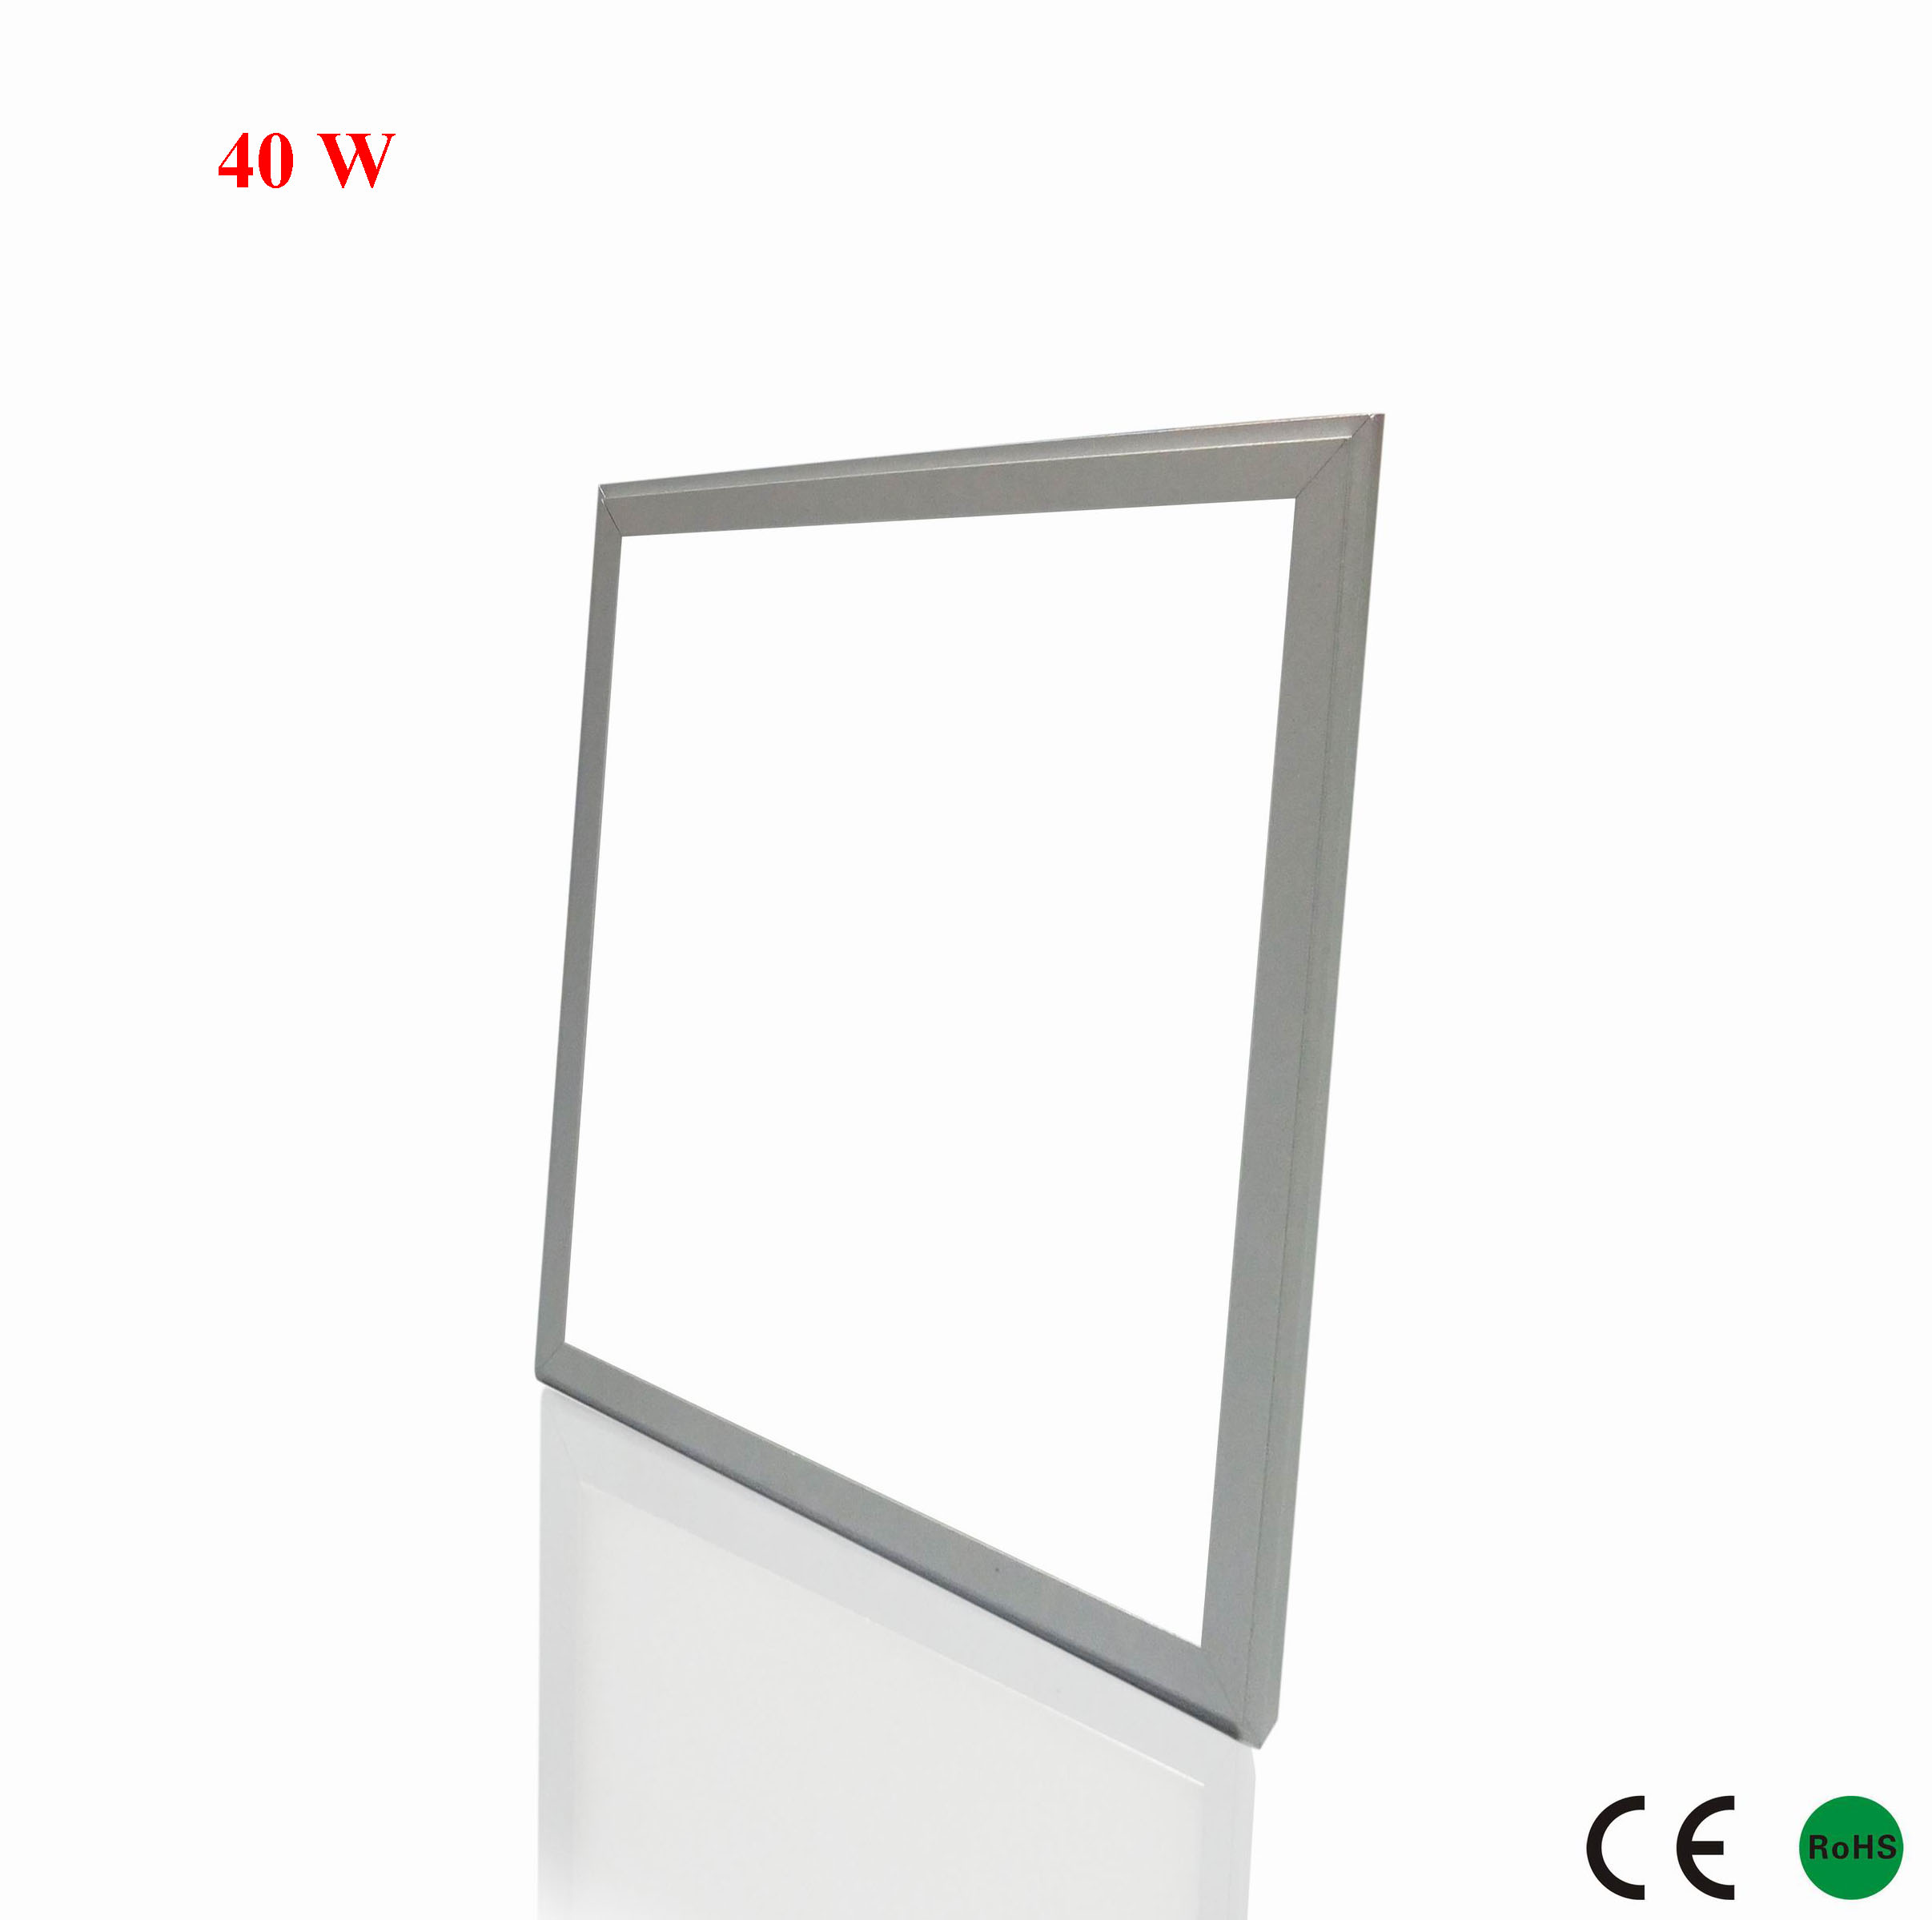 led panel lighting, flat led panel, led flat panel light, led panel light fixture